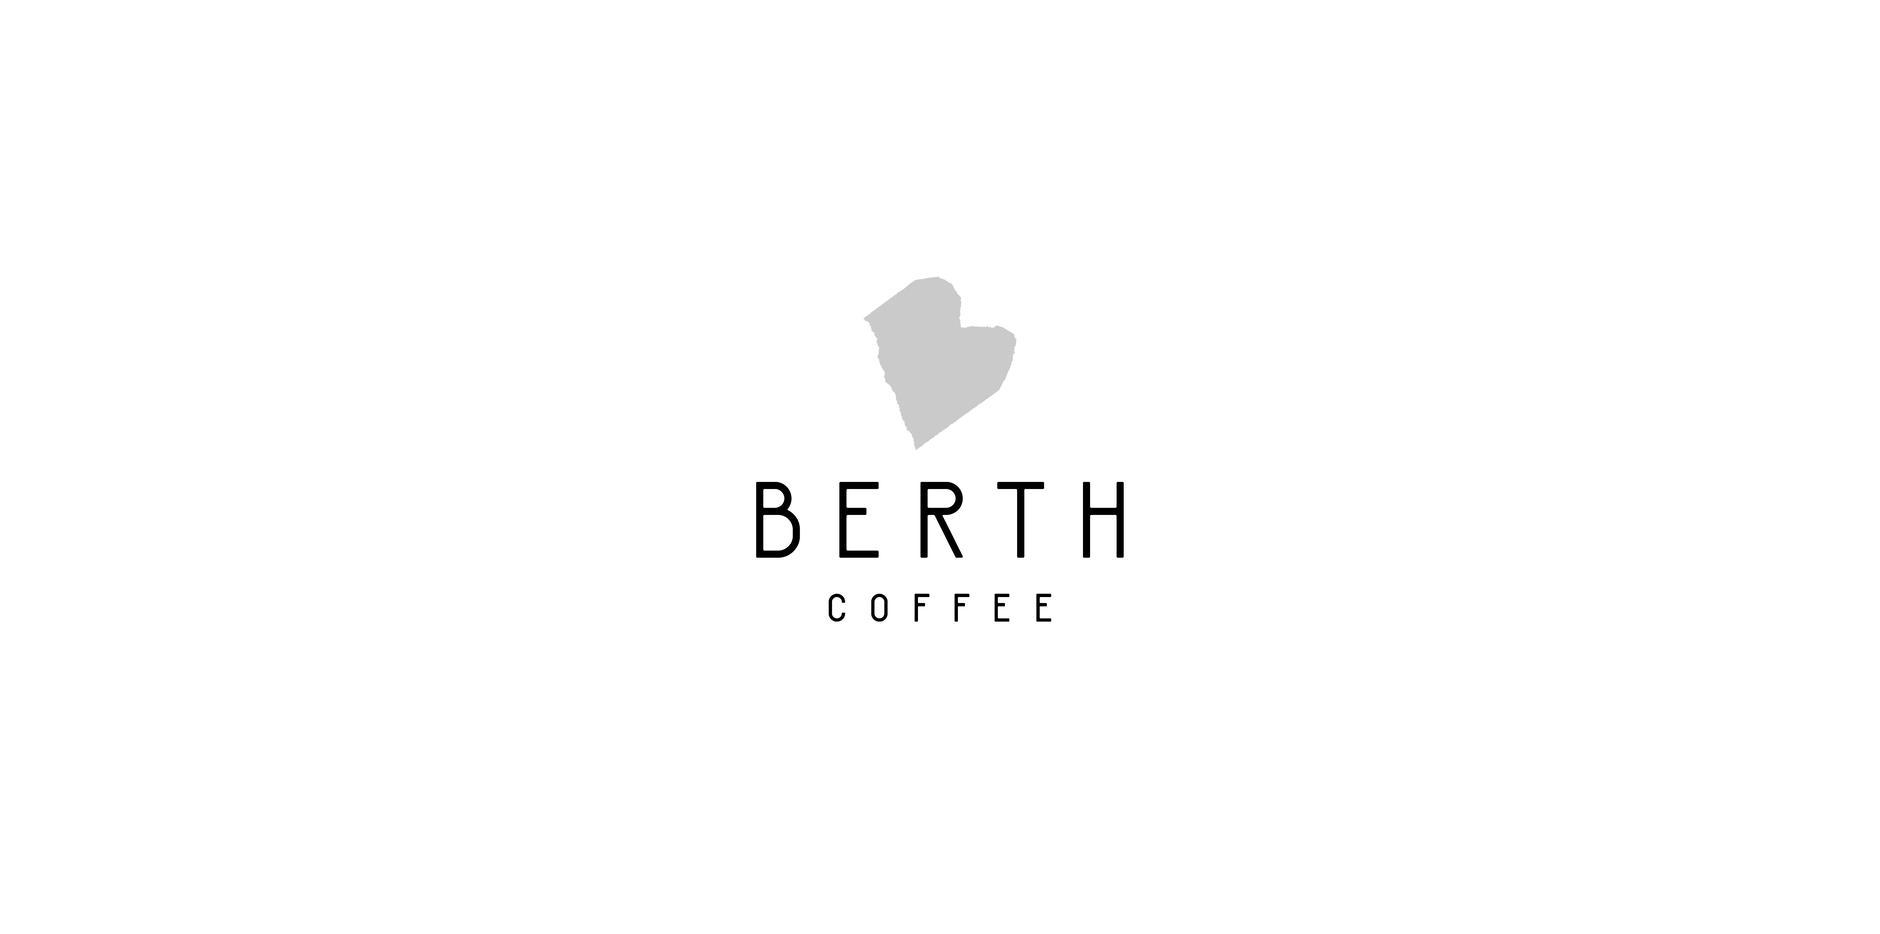 BERTH COFFEE ONLINE STORE